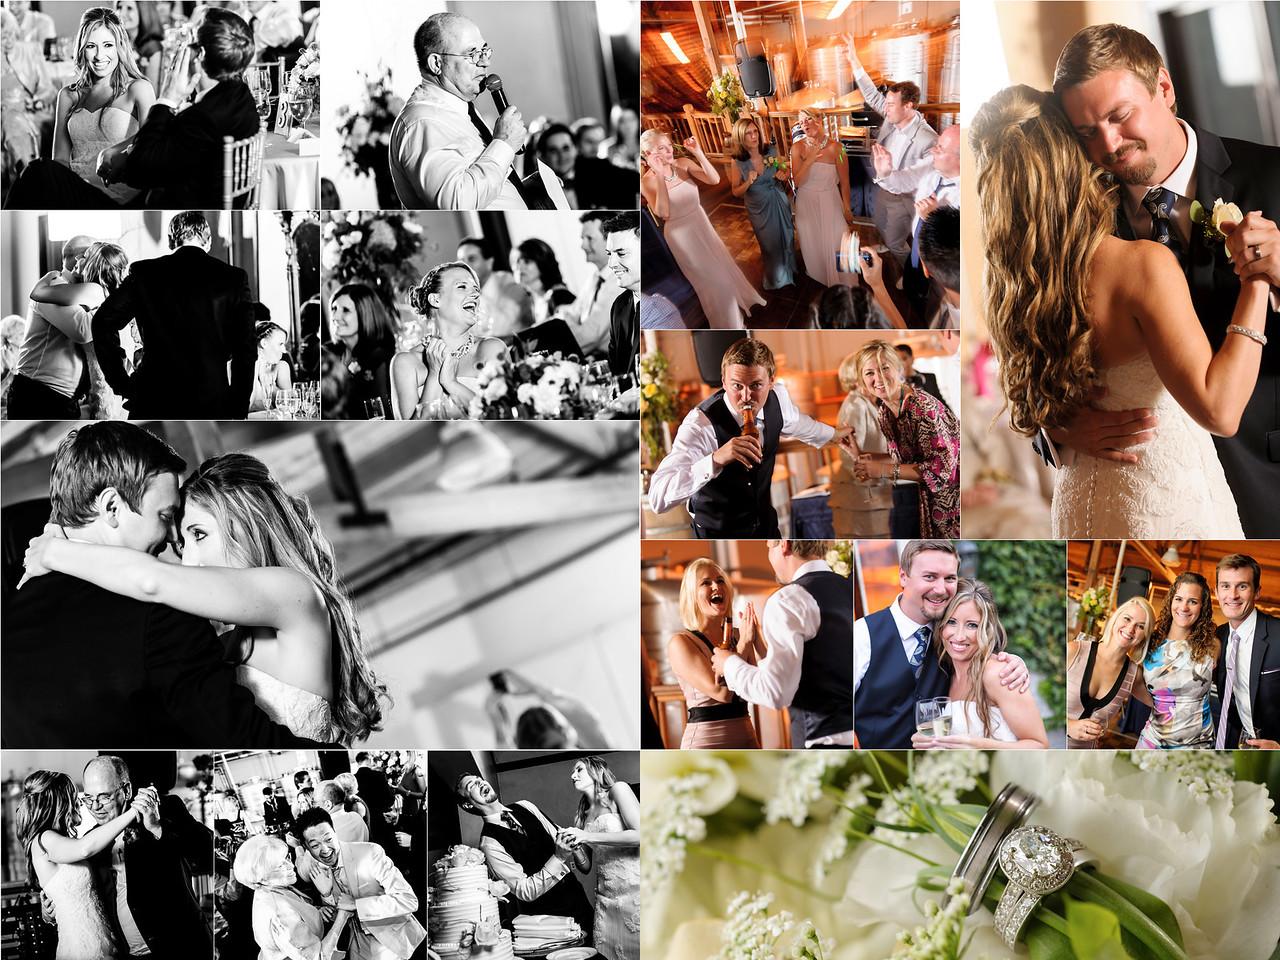 Erica_and_Justin_Byington_Winery_Los_Gatos_Wedding_Photography_4x6_Photo_Board_07